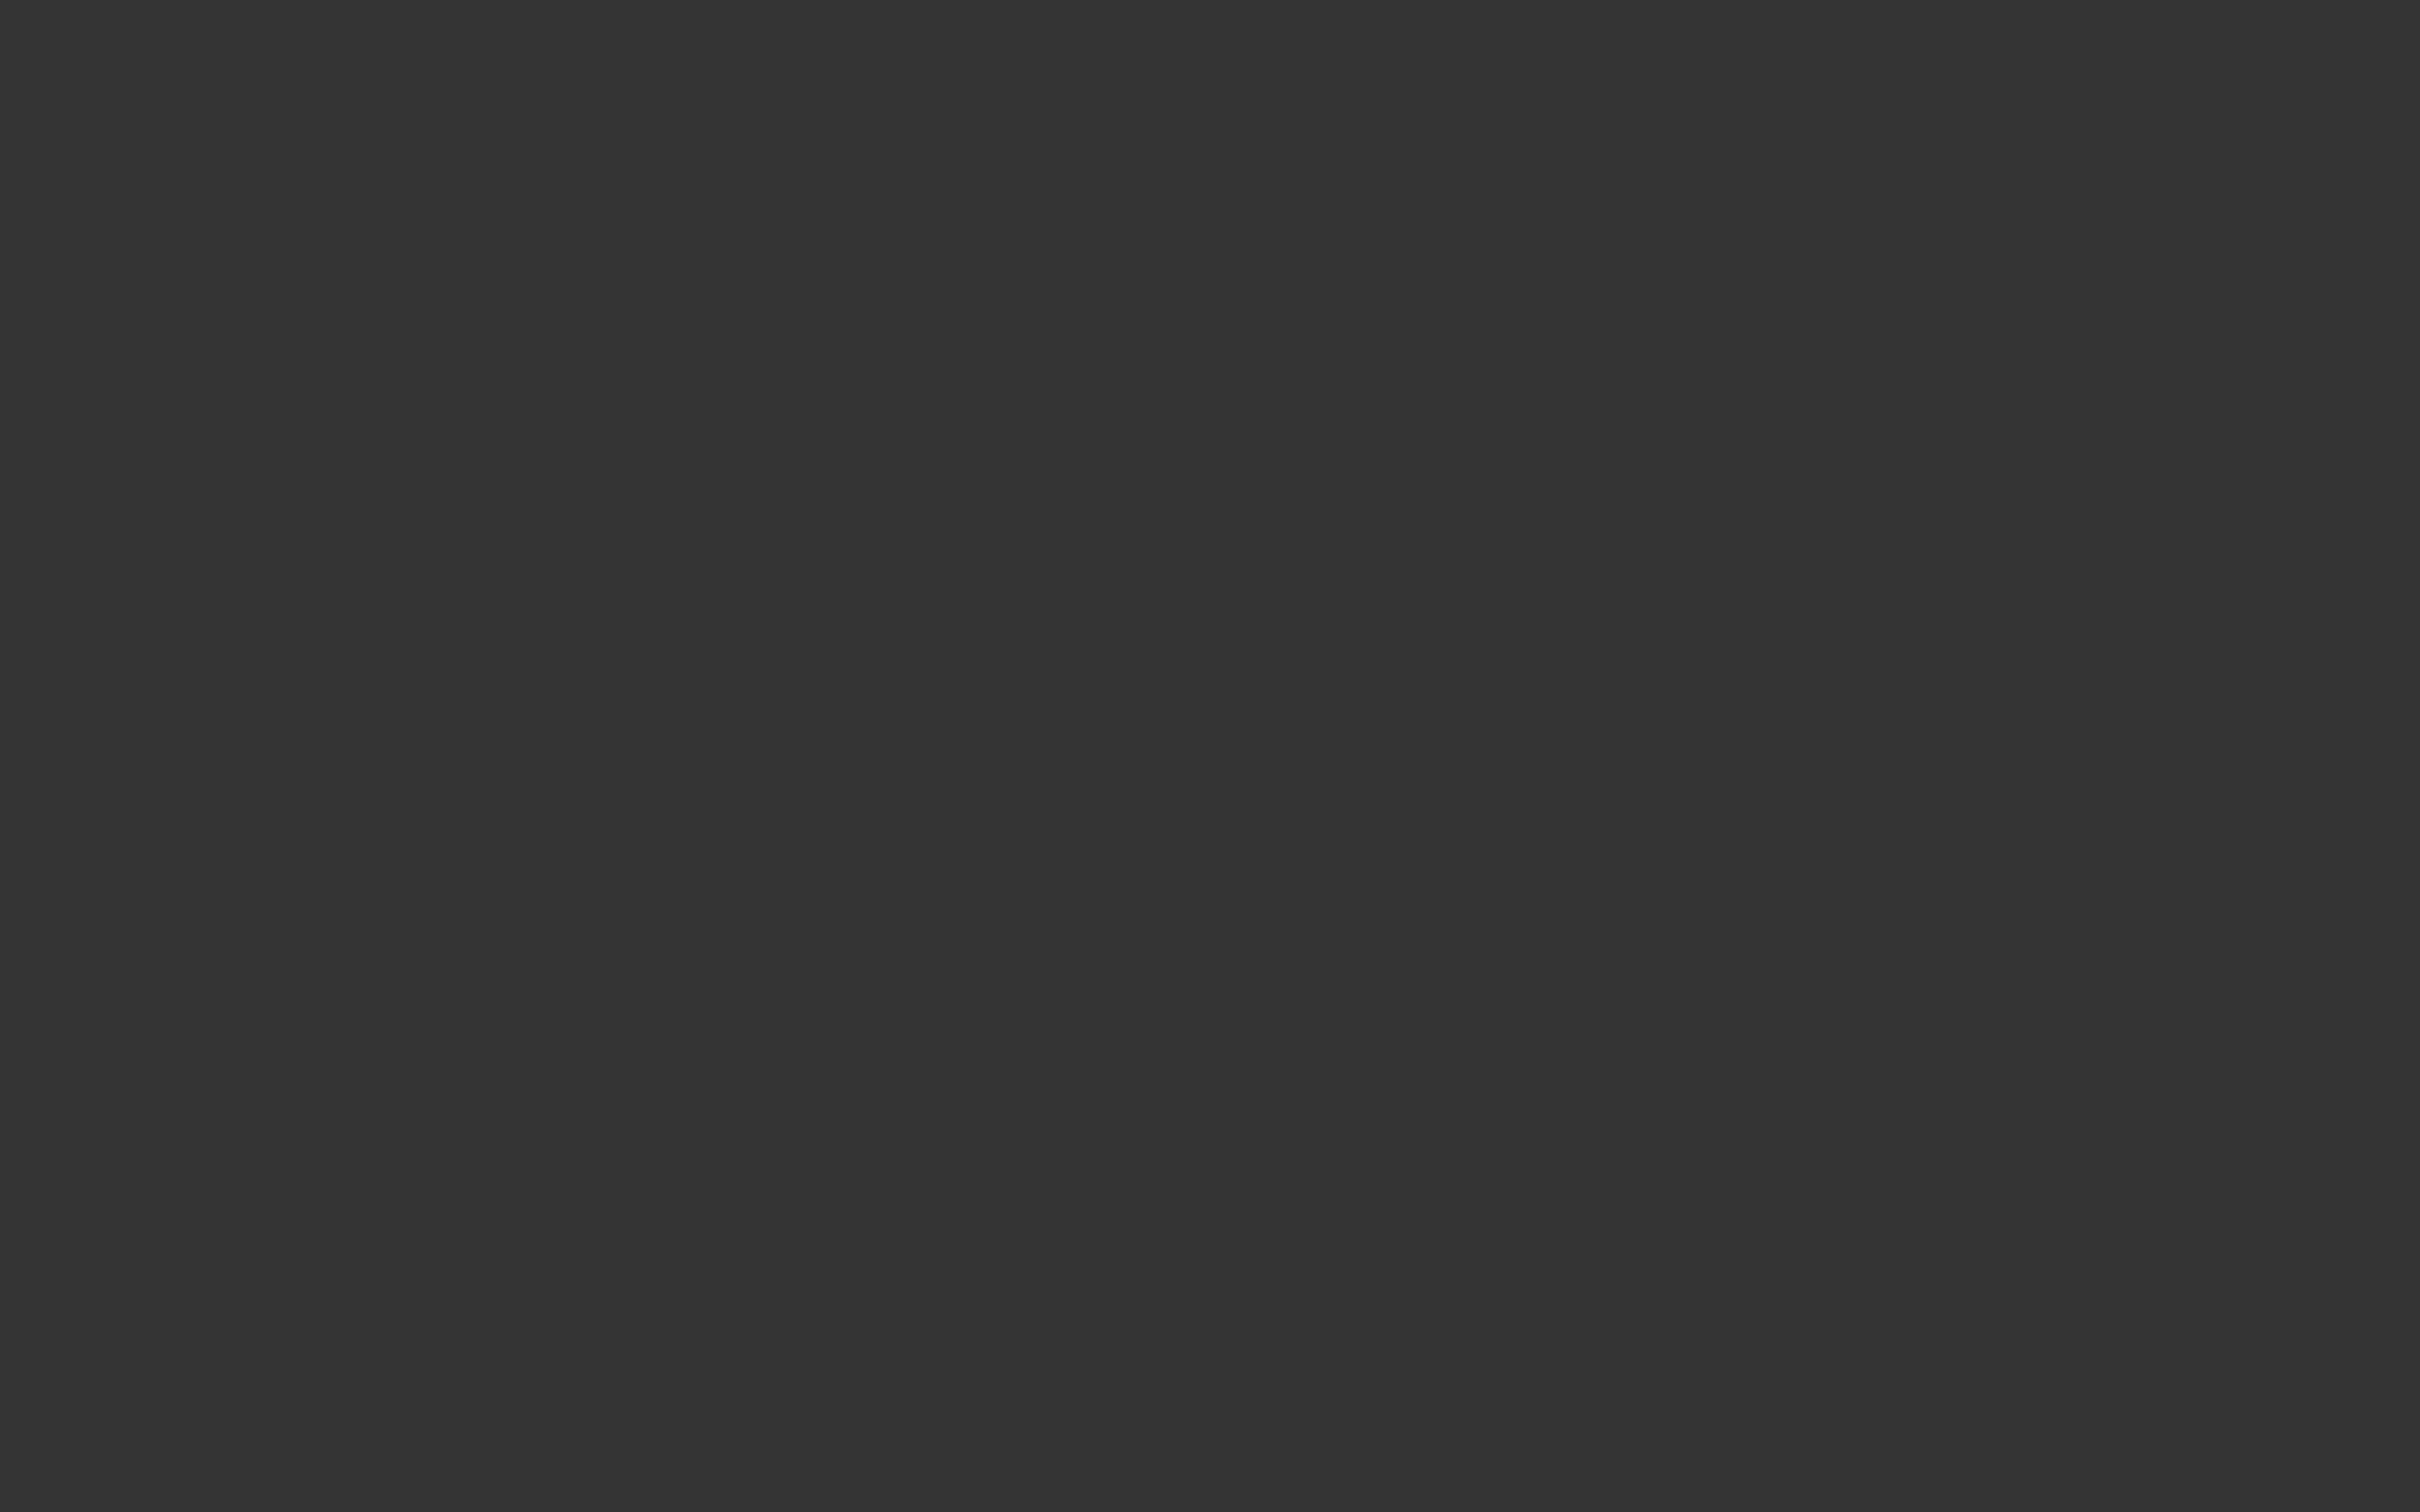 2560x1600 Jet Solid Color Background